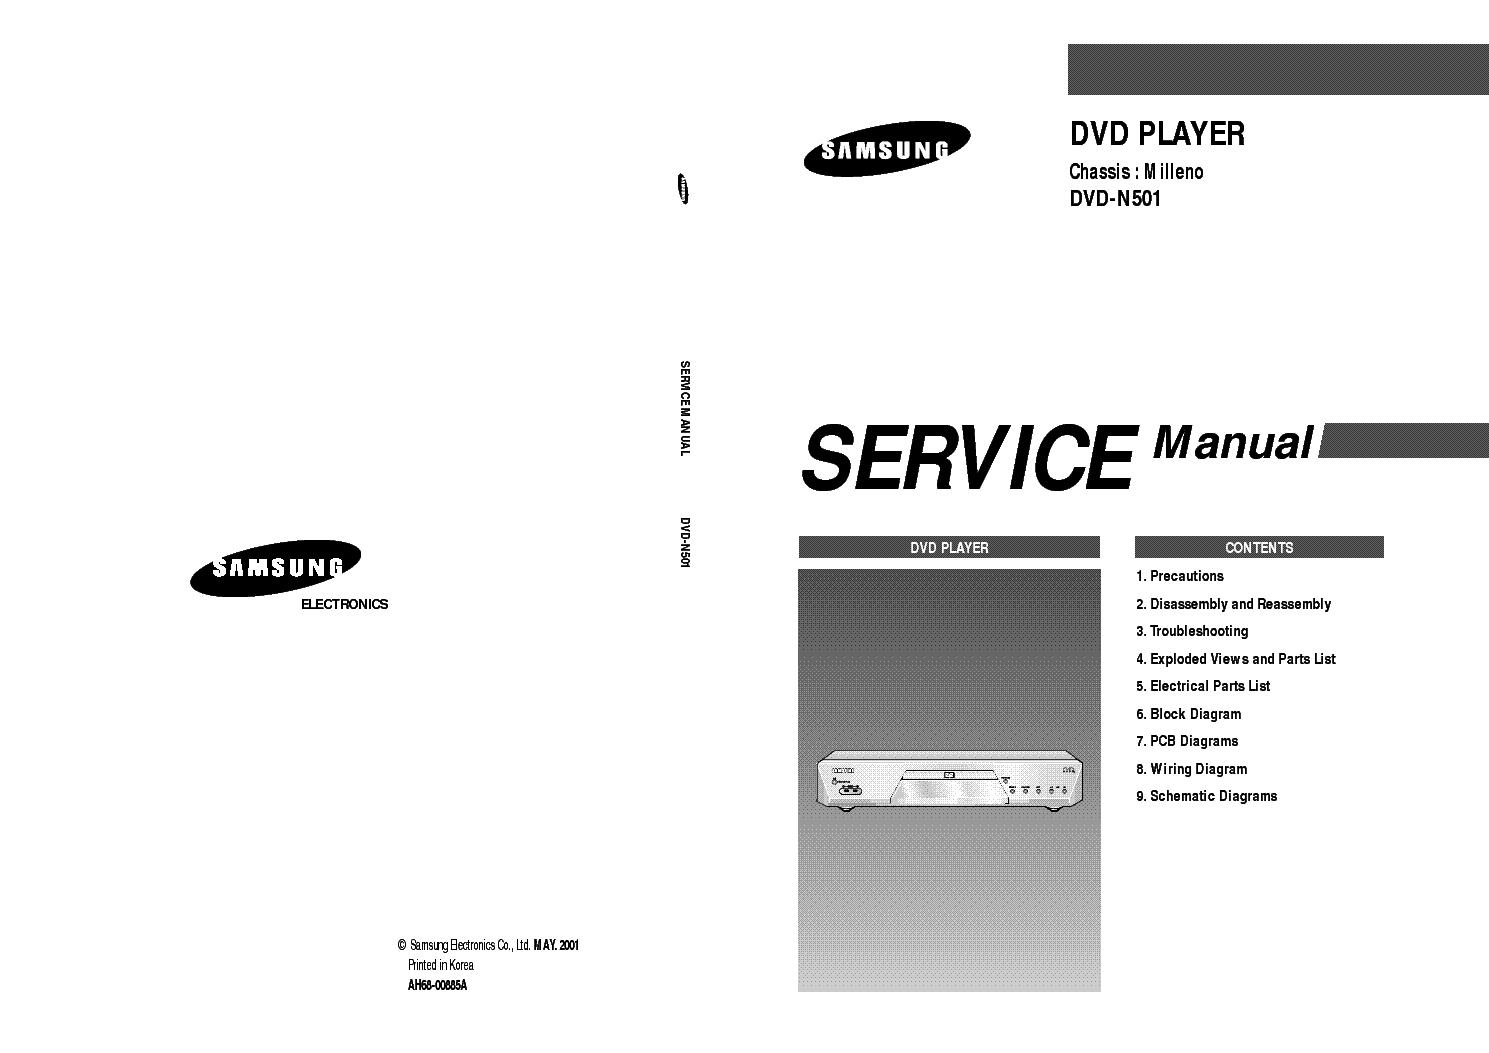 Samsung Dvd N501 Sm Service Manual Download Schematics Eeprom Player Wiring Diagram 1st Page